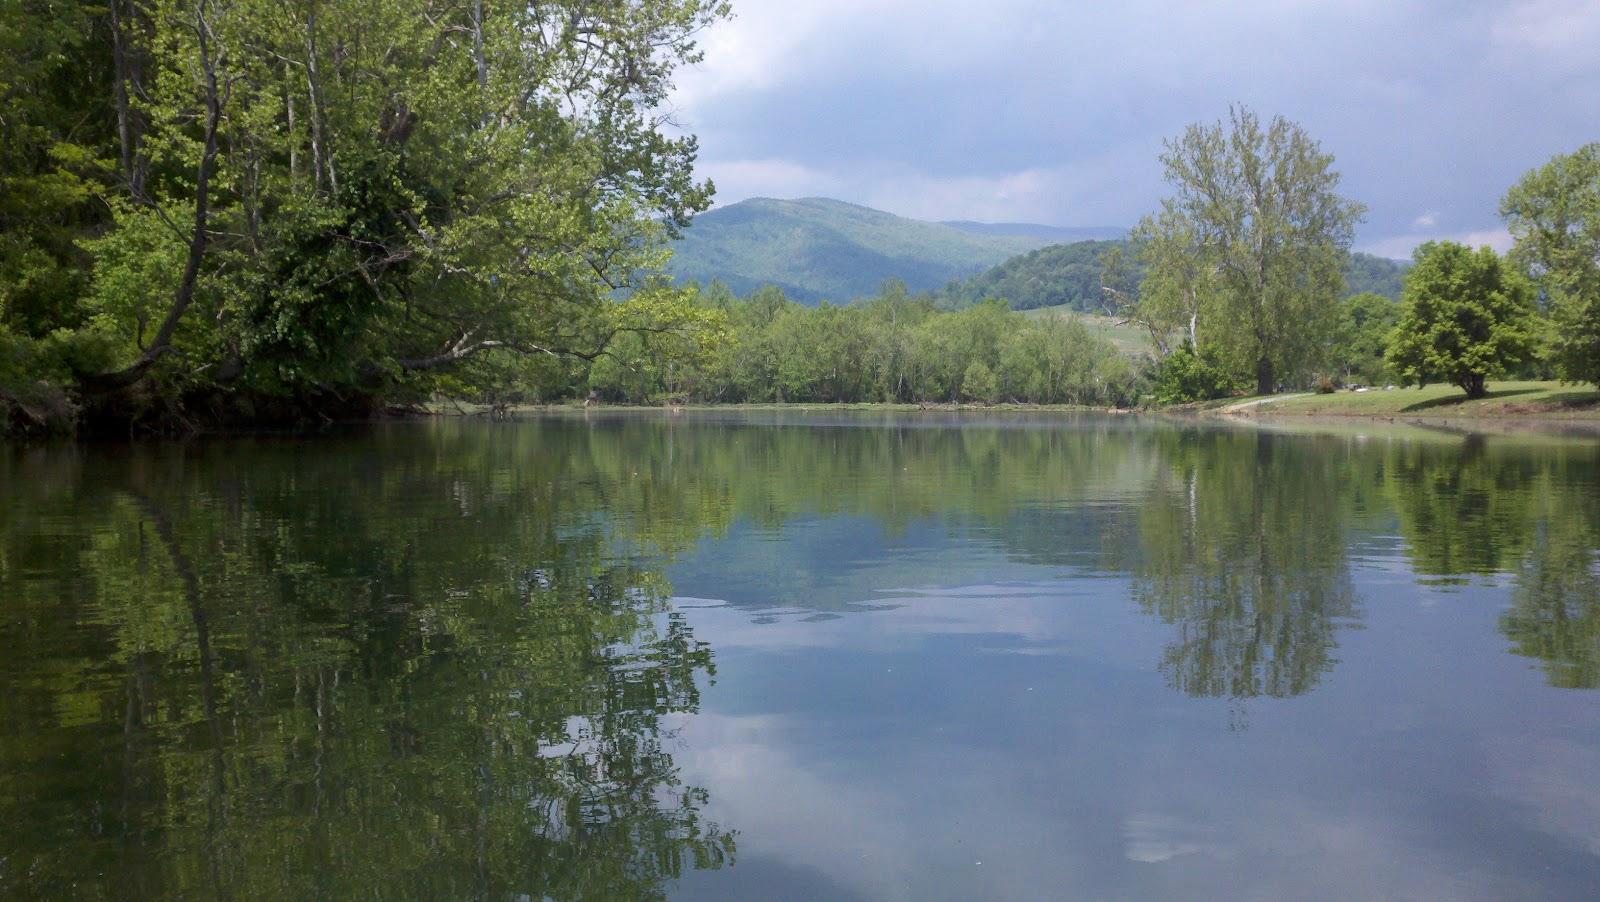 Tnvarmint watauga river information for Watauga river fishing